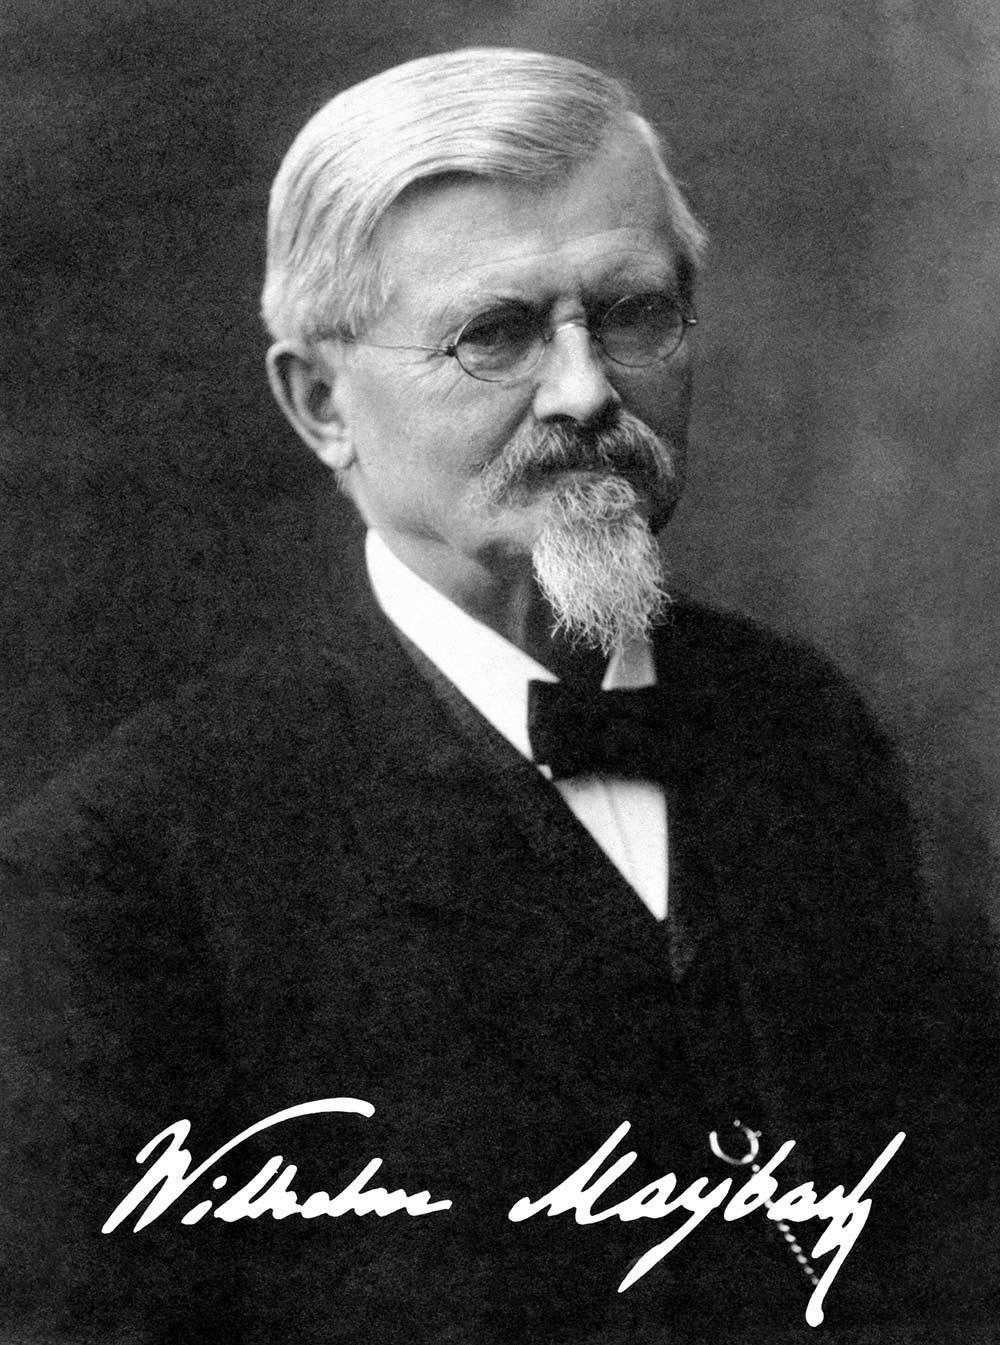 Wilhelm Maybach (9. Februar 1846 - 29. Dezember 1929)